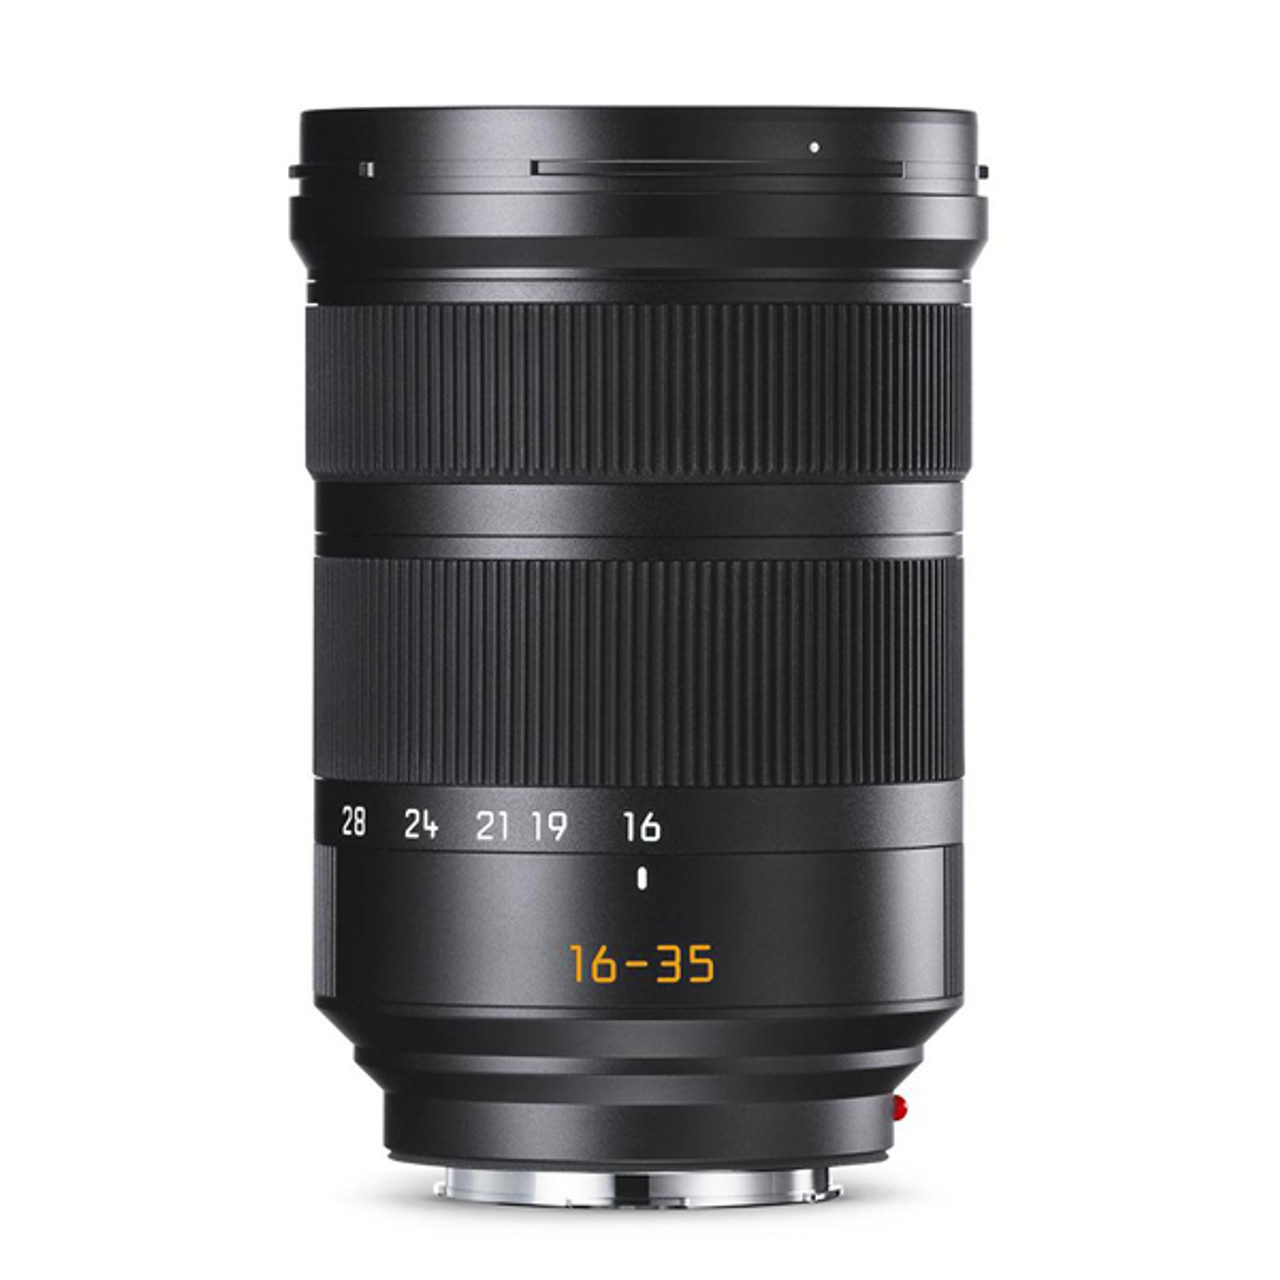 Leica Super-Vario-Elmar-SL 16-35 f/3.5-4.5 ASPH (11177)